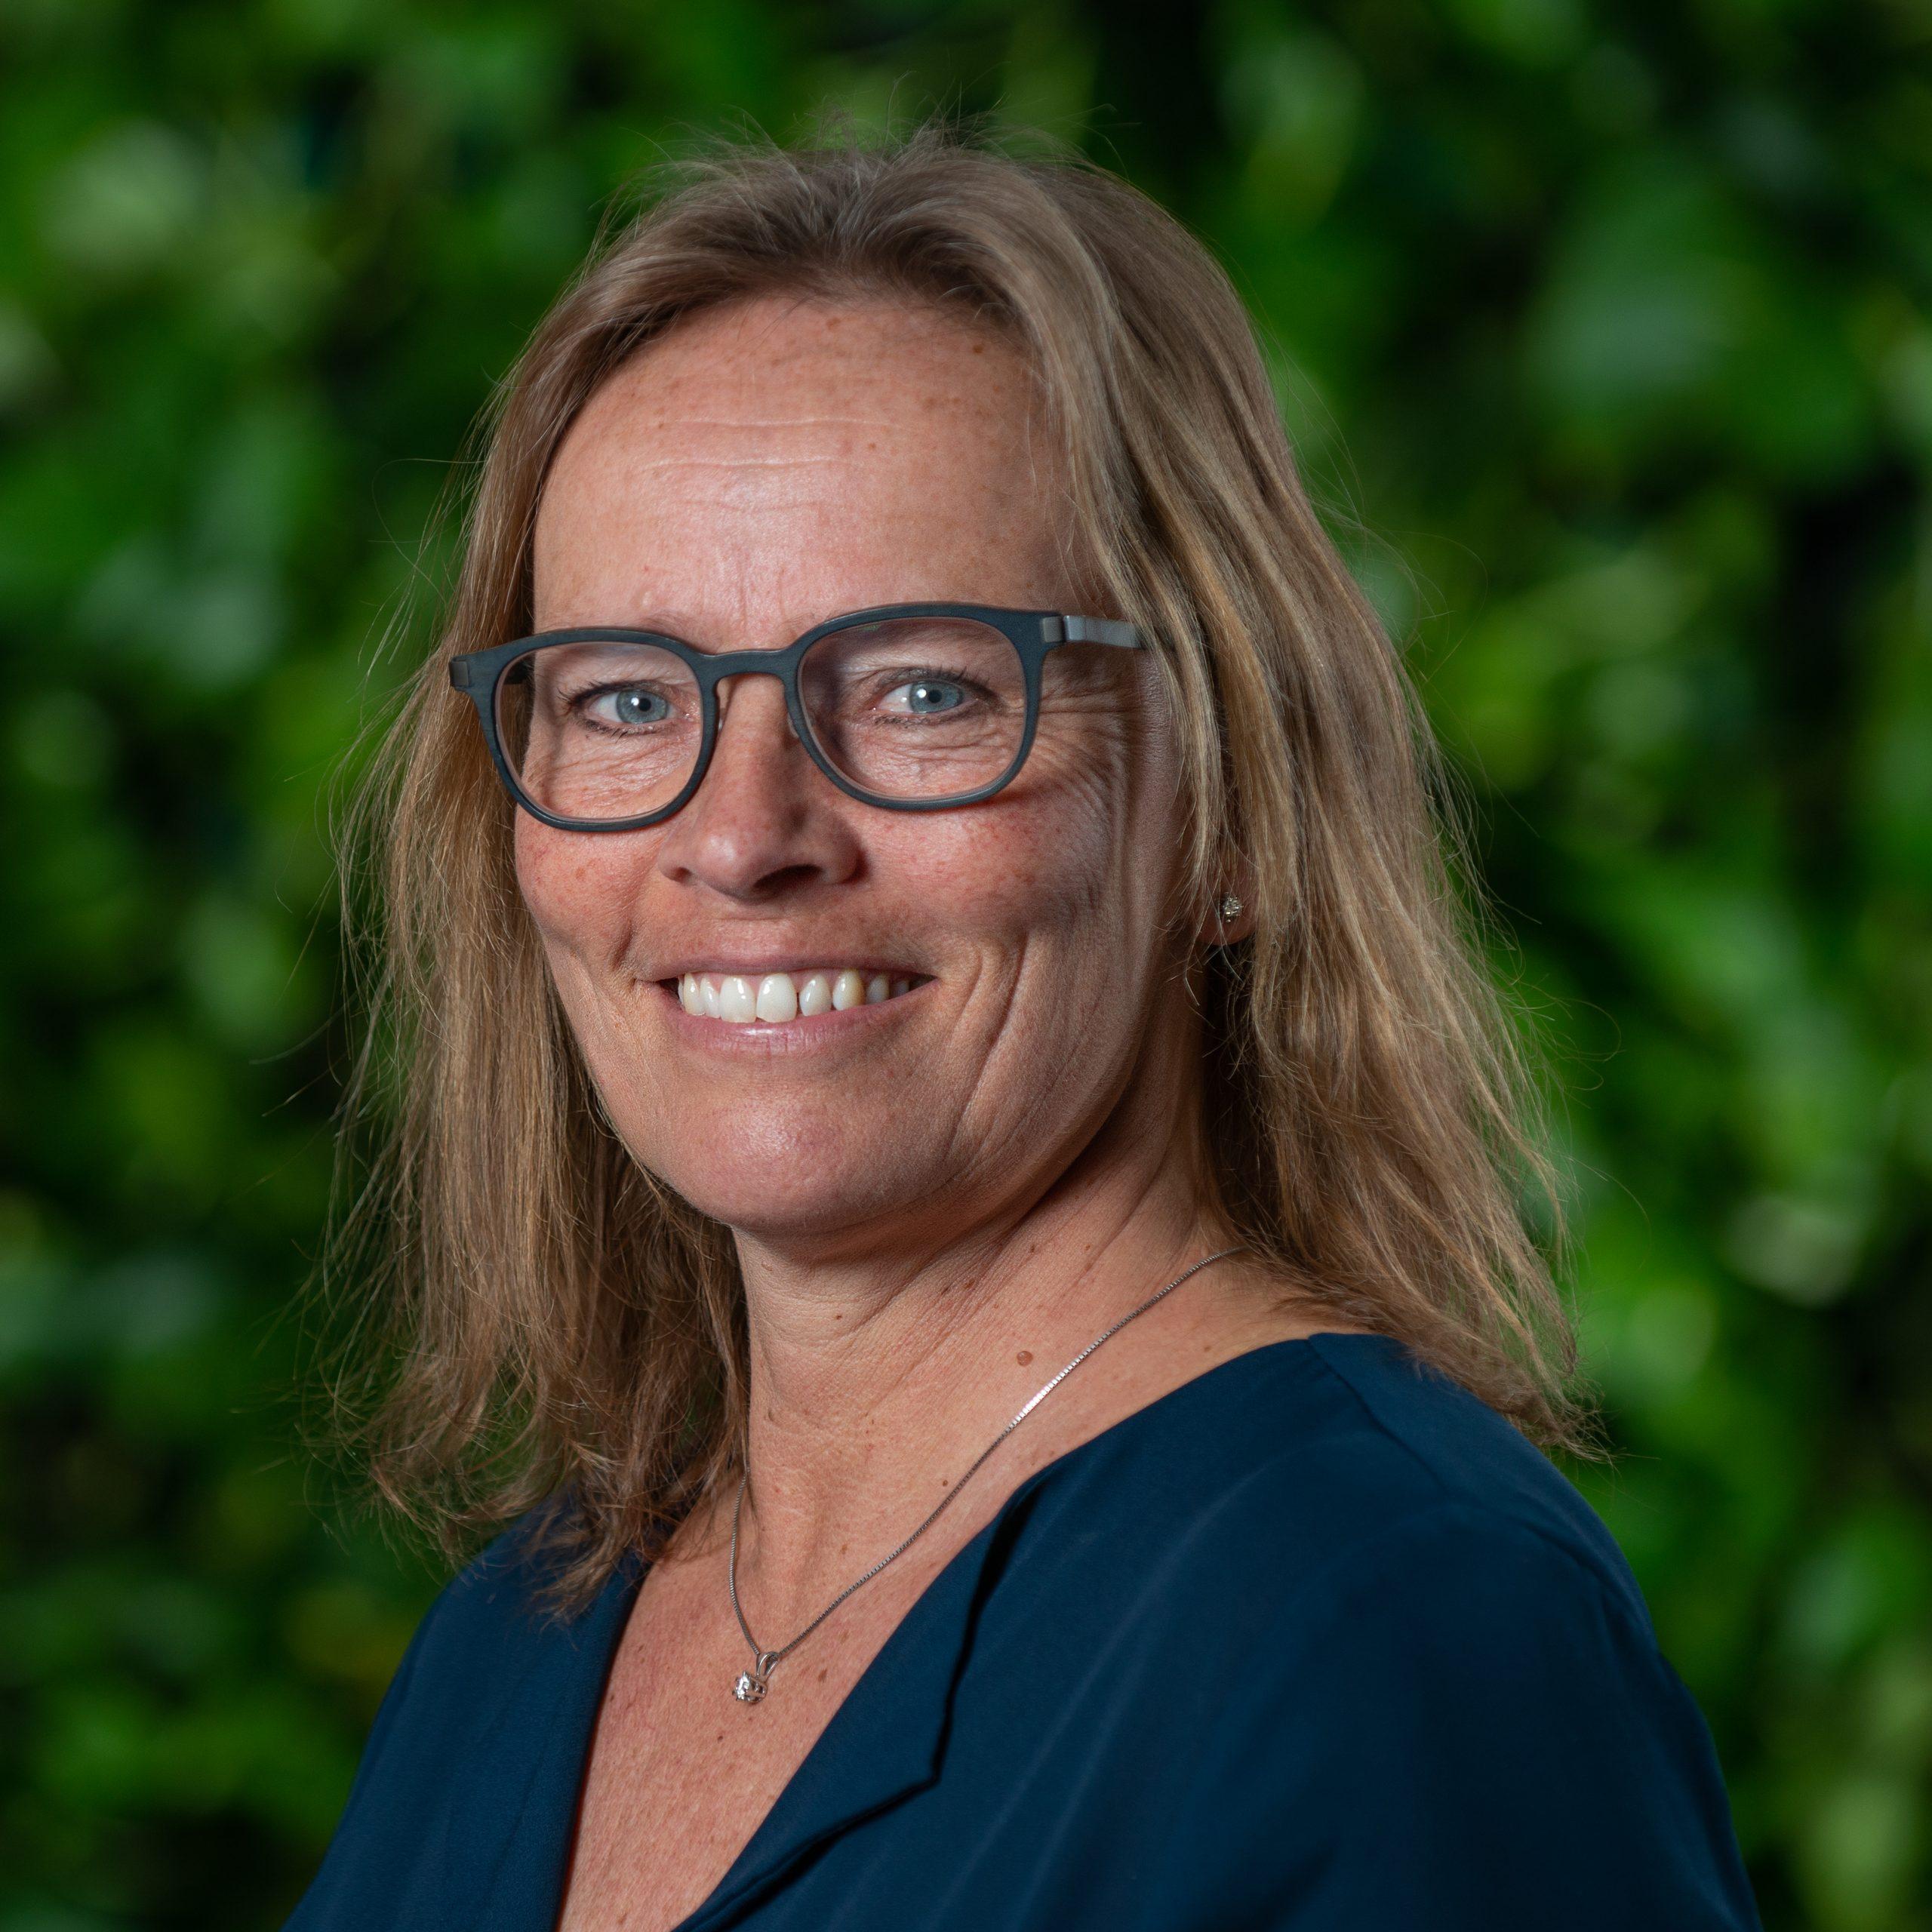 Kathrine G. Andersen